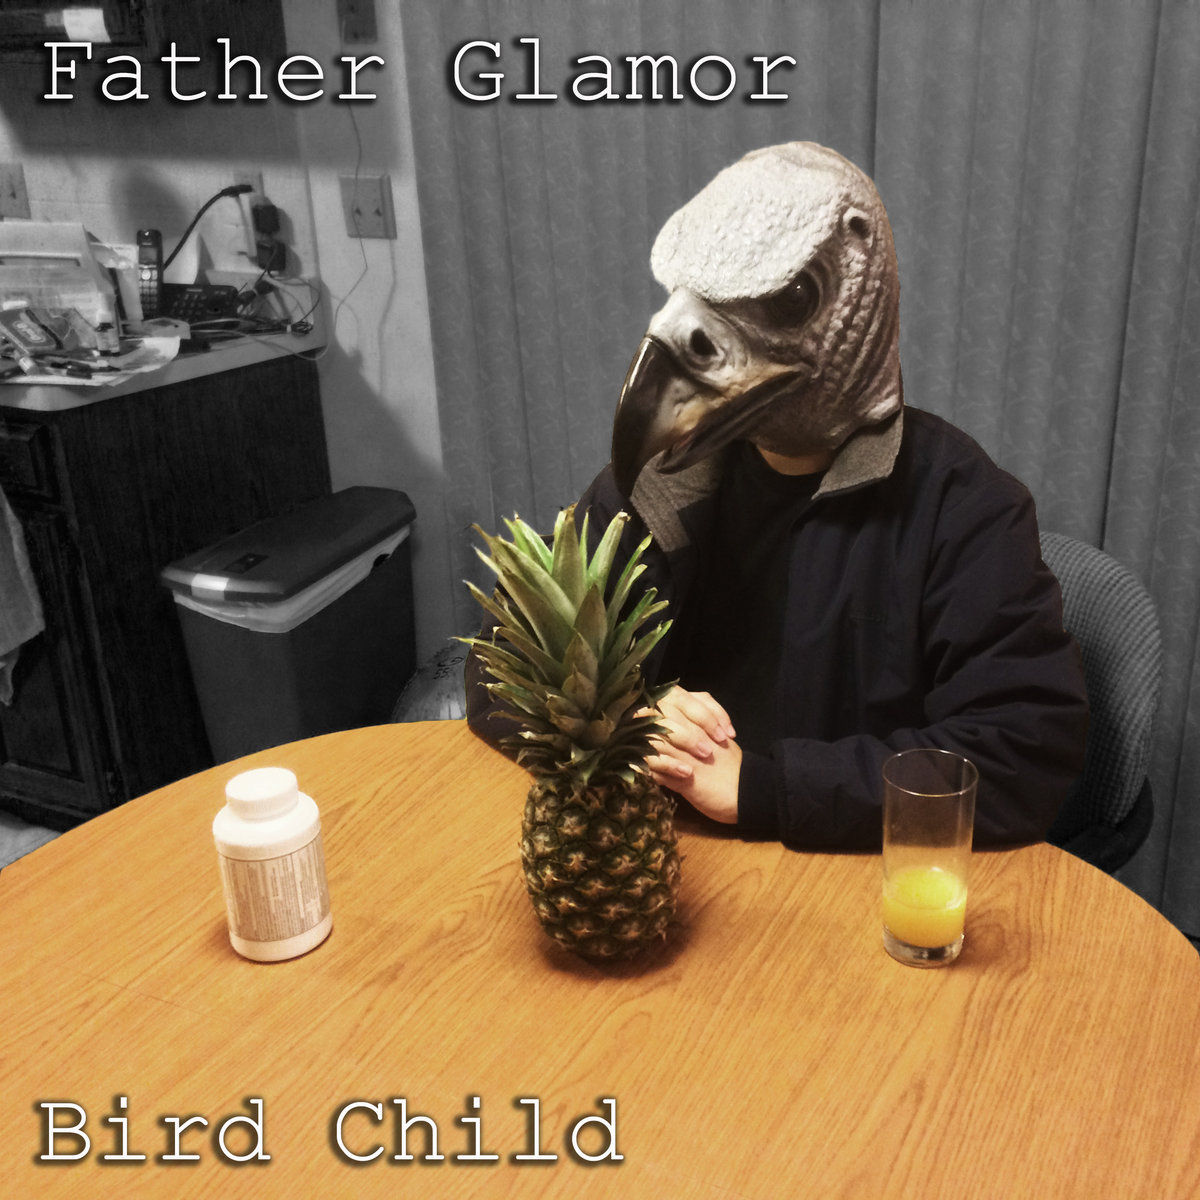 fatherglamor